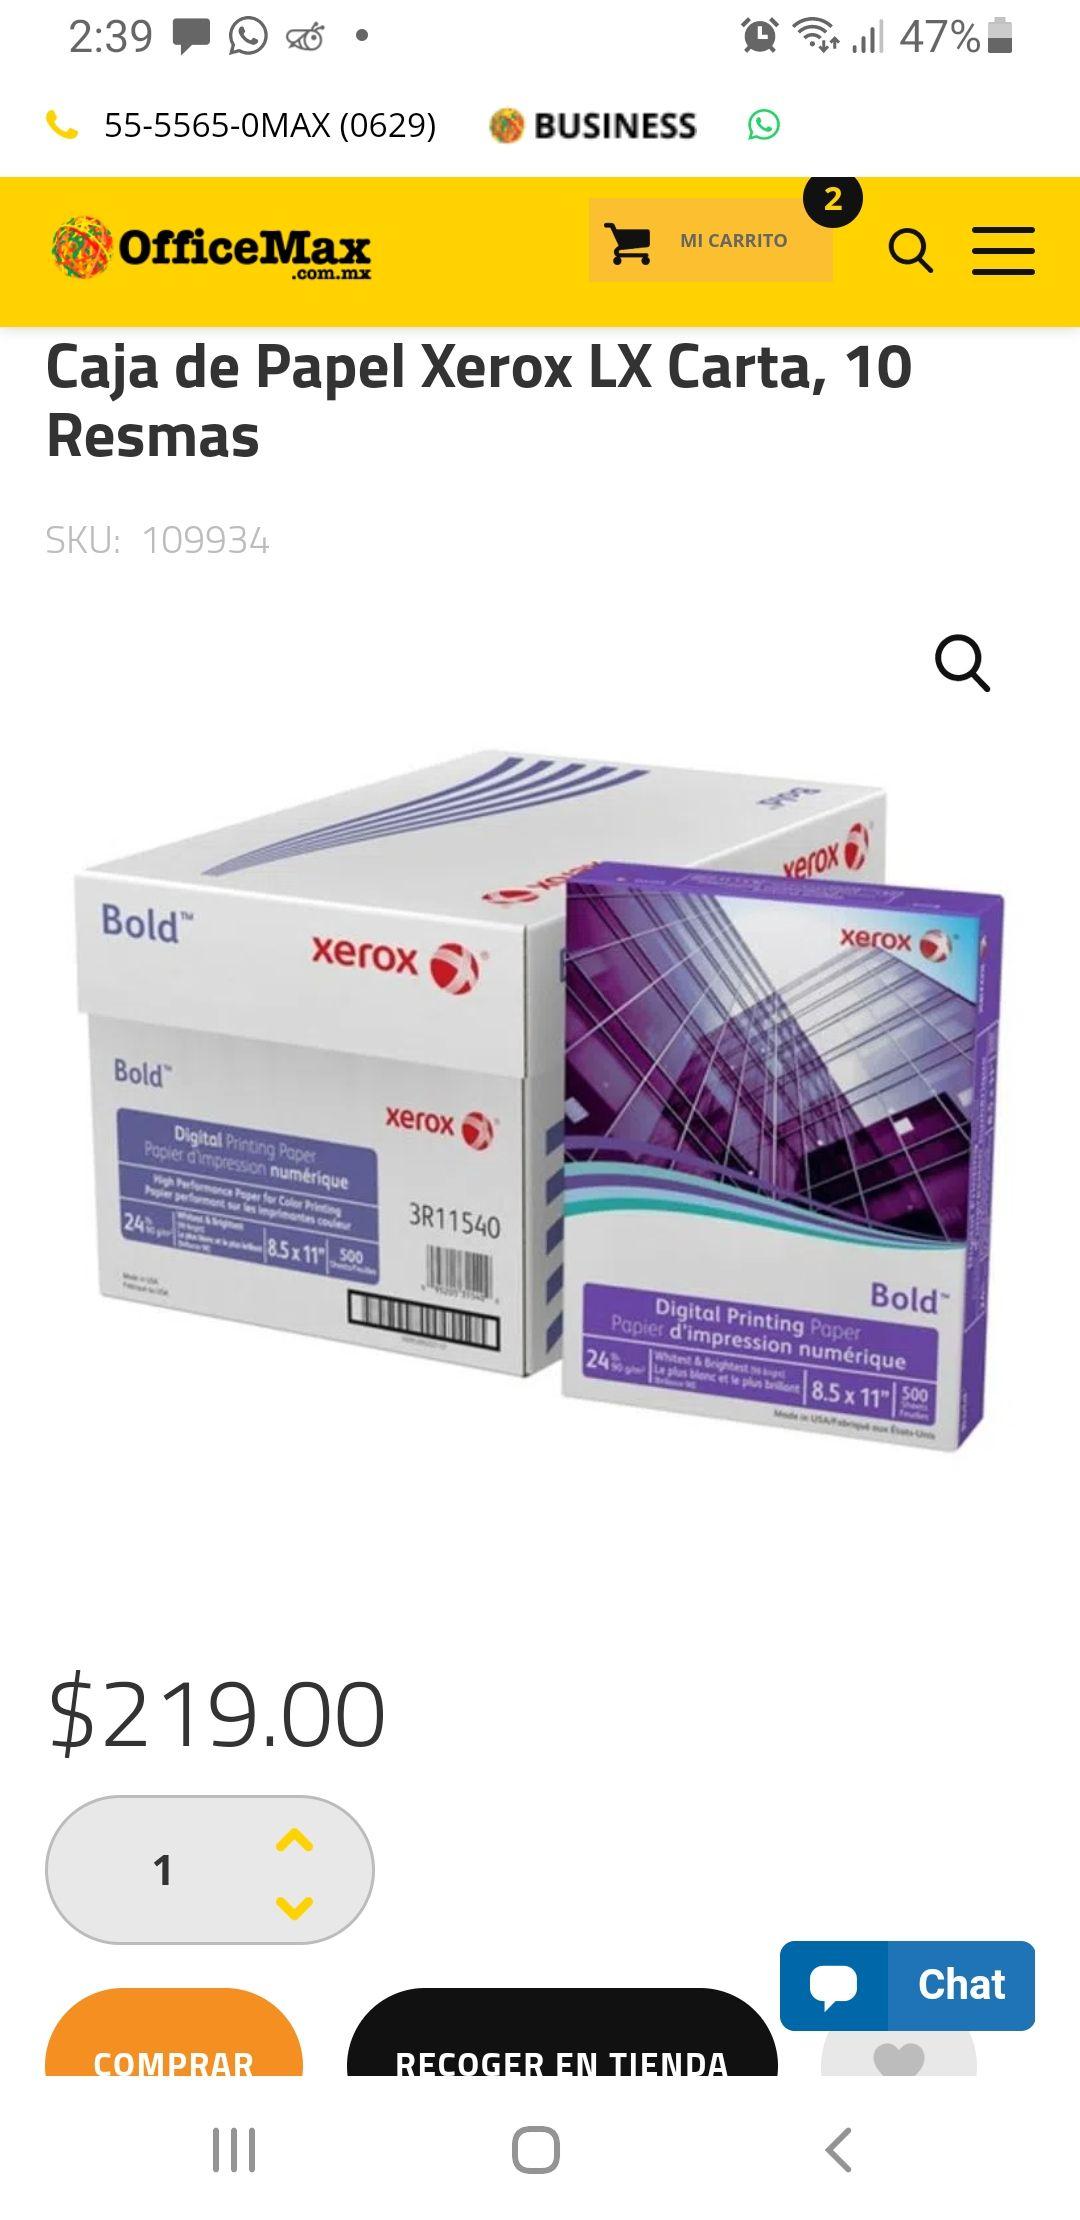 OFFICEMAX: Caja de Papel Xerox LX Carta, 10 Resmas